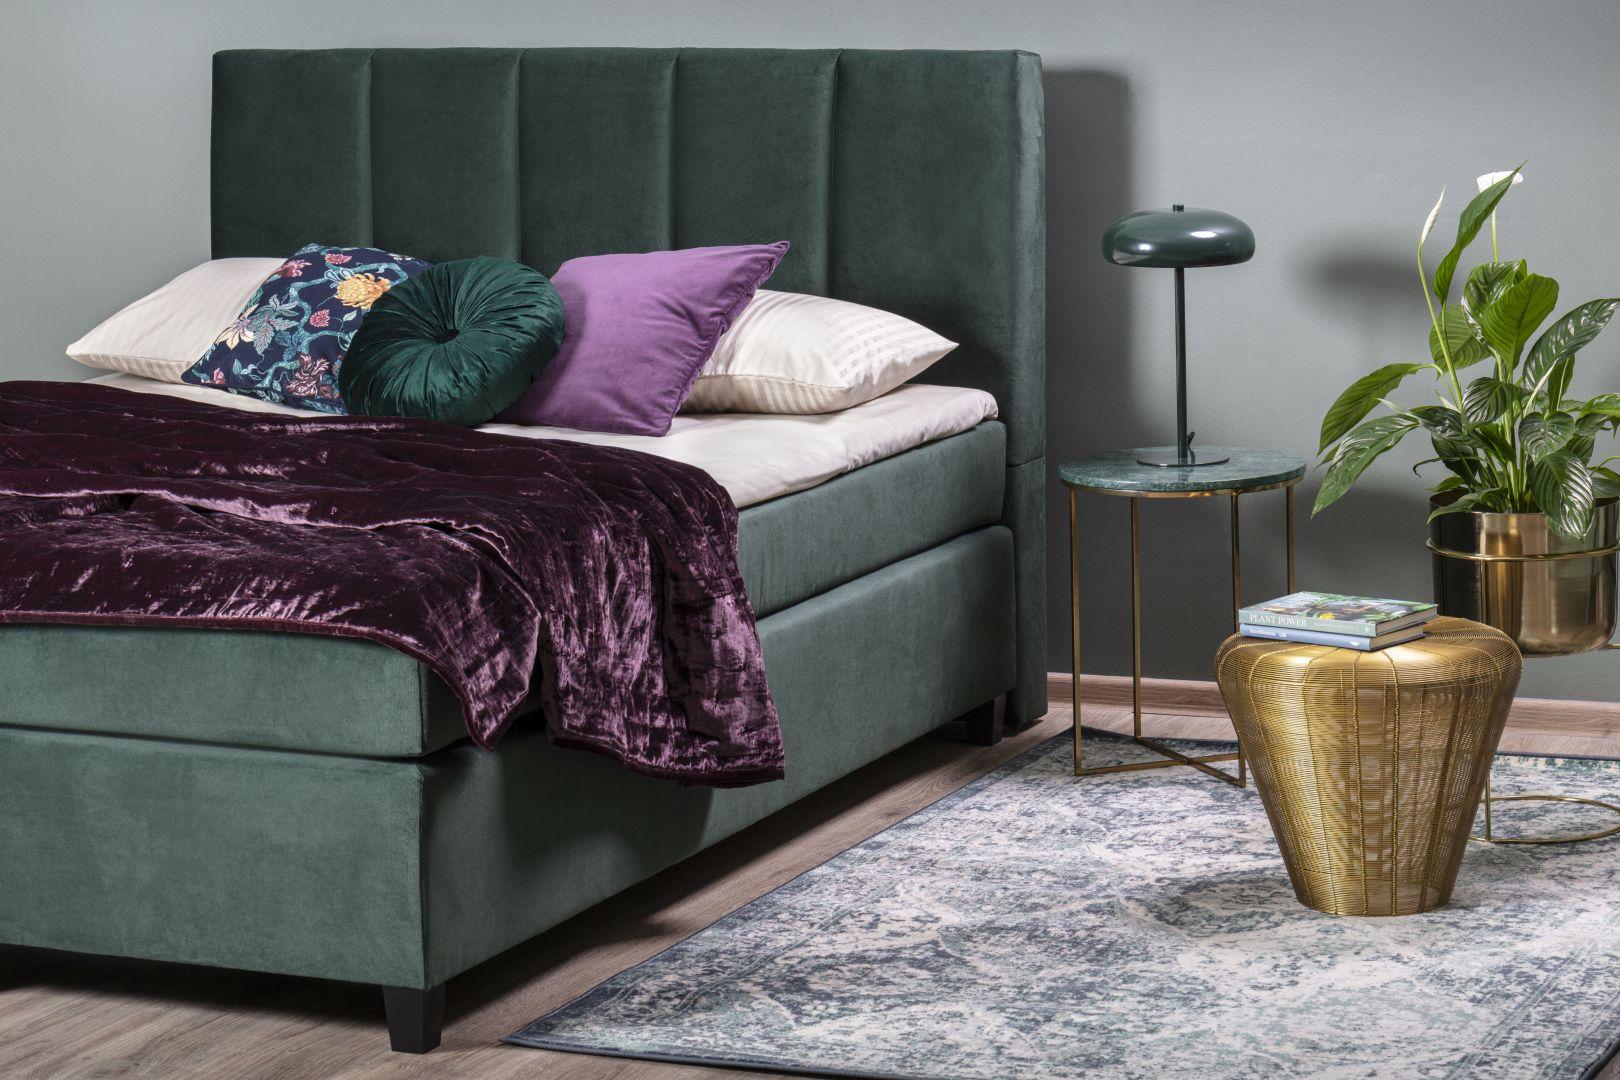 Łóżko kontynentalne Arizona. Fot. Comfort4U